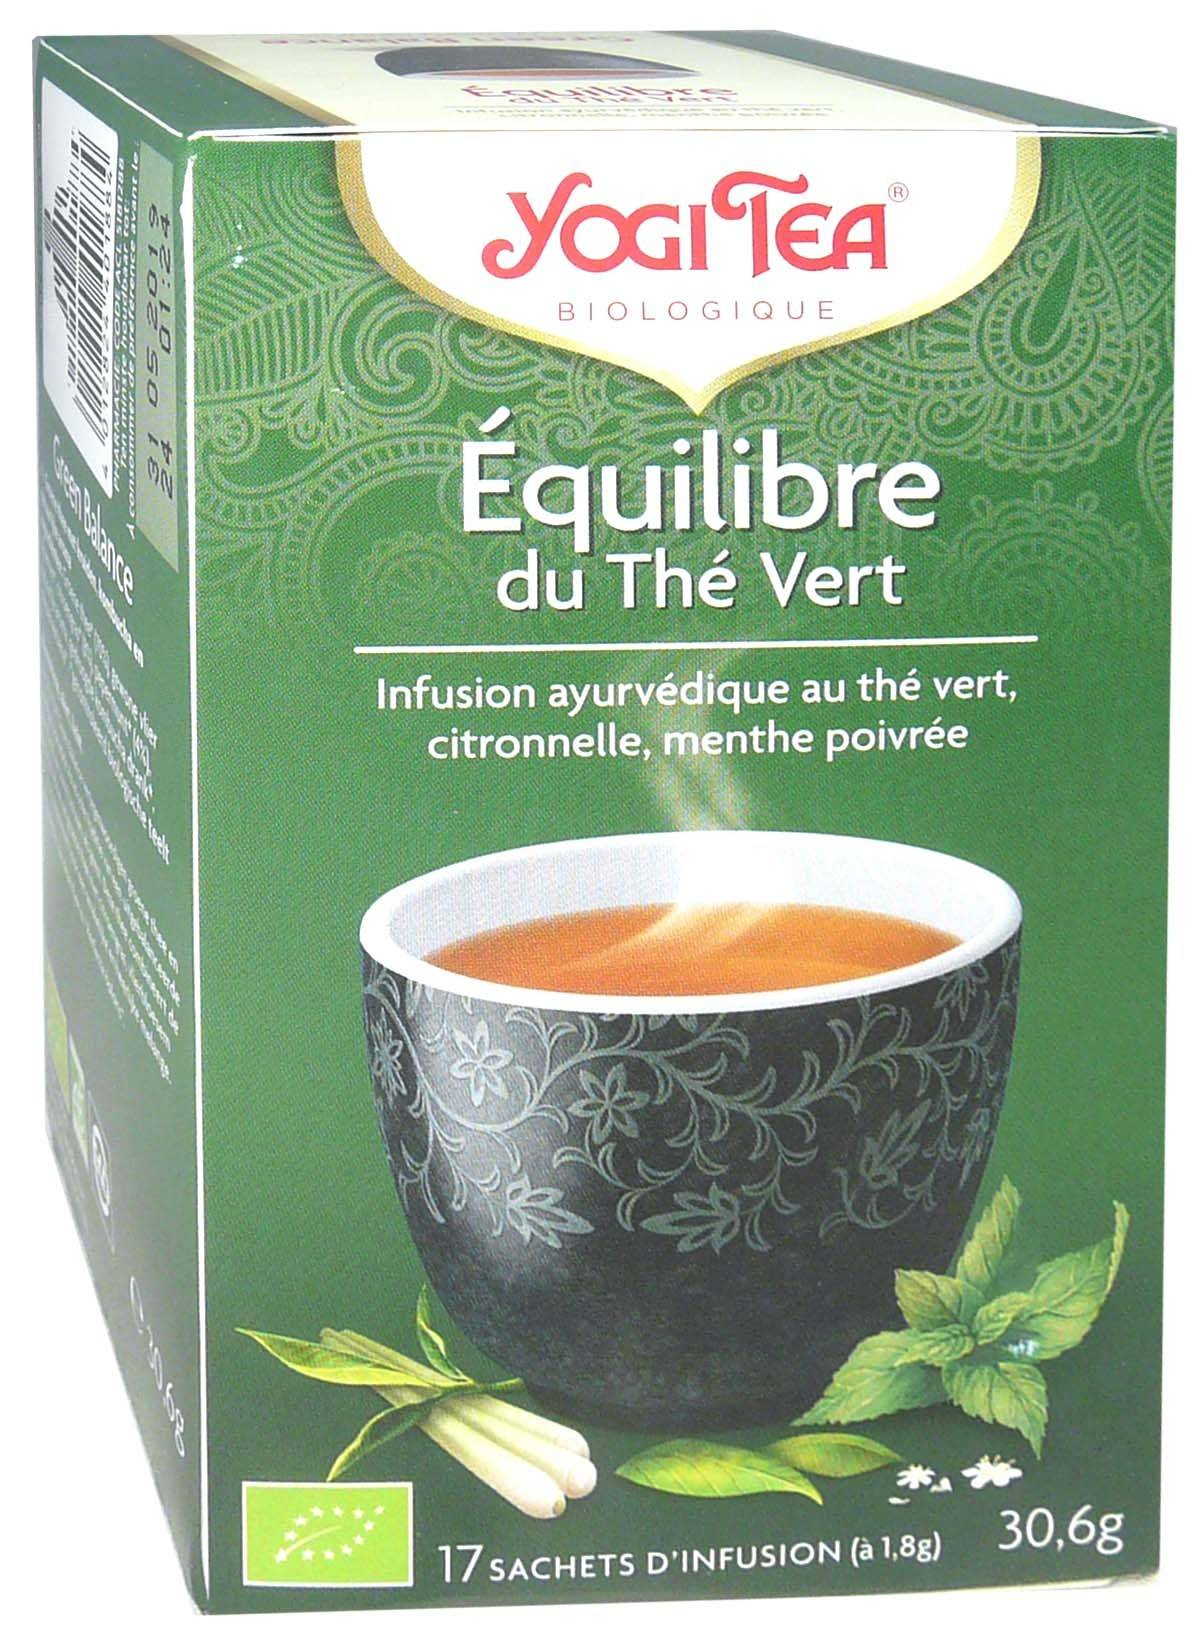 Yogi tea infusion equilibre du the vert x17 sachets